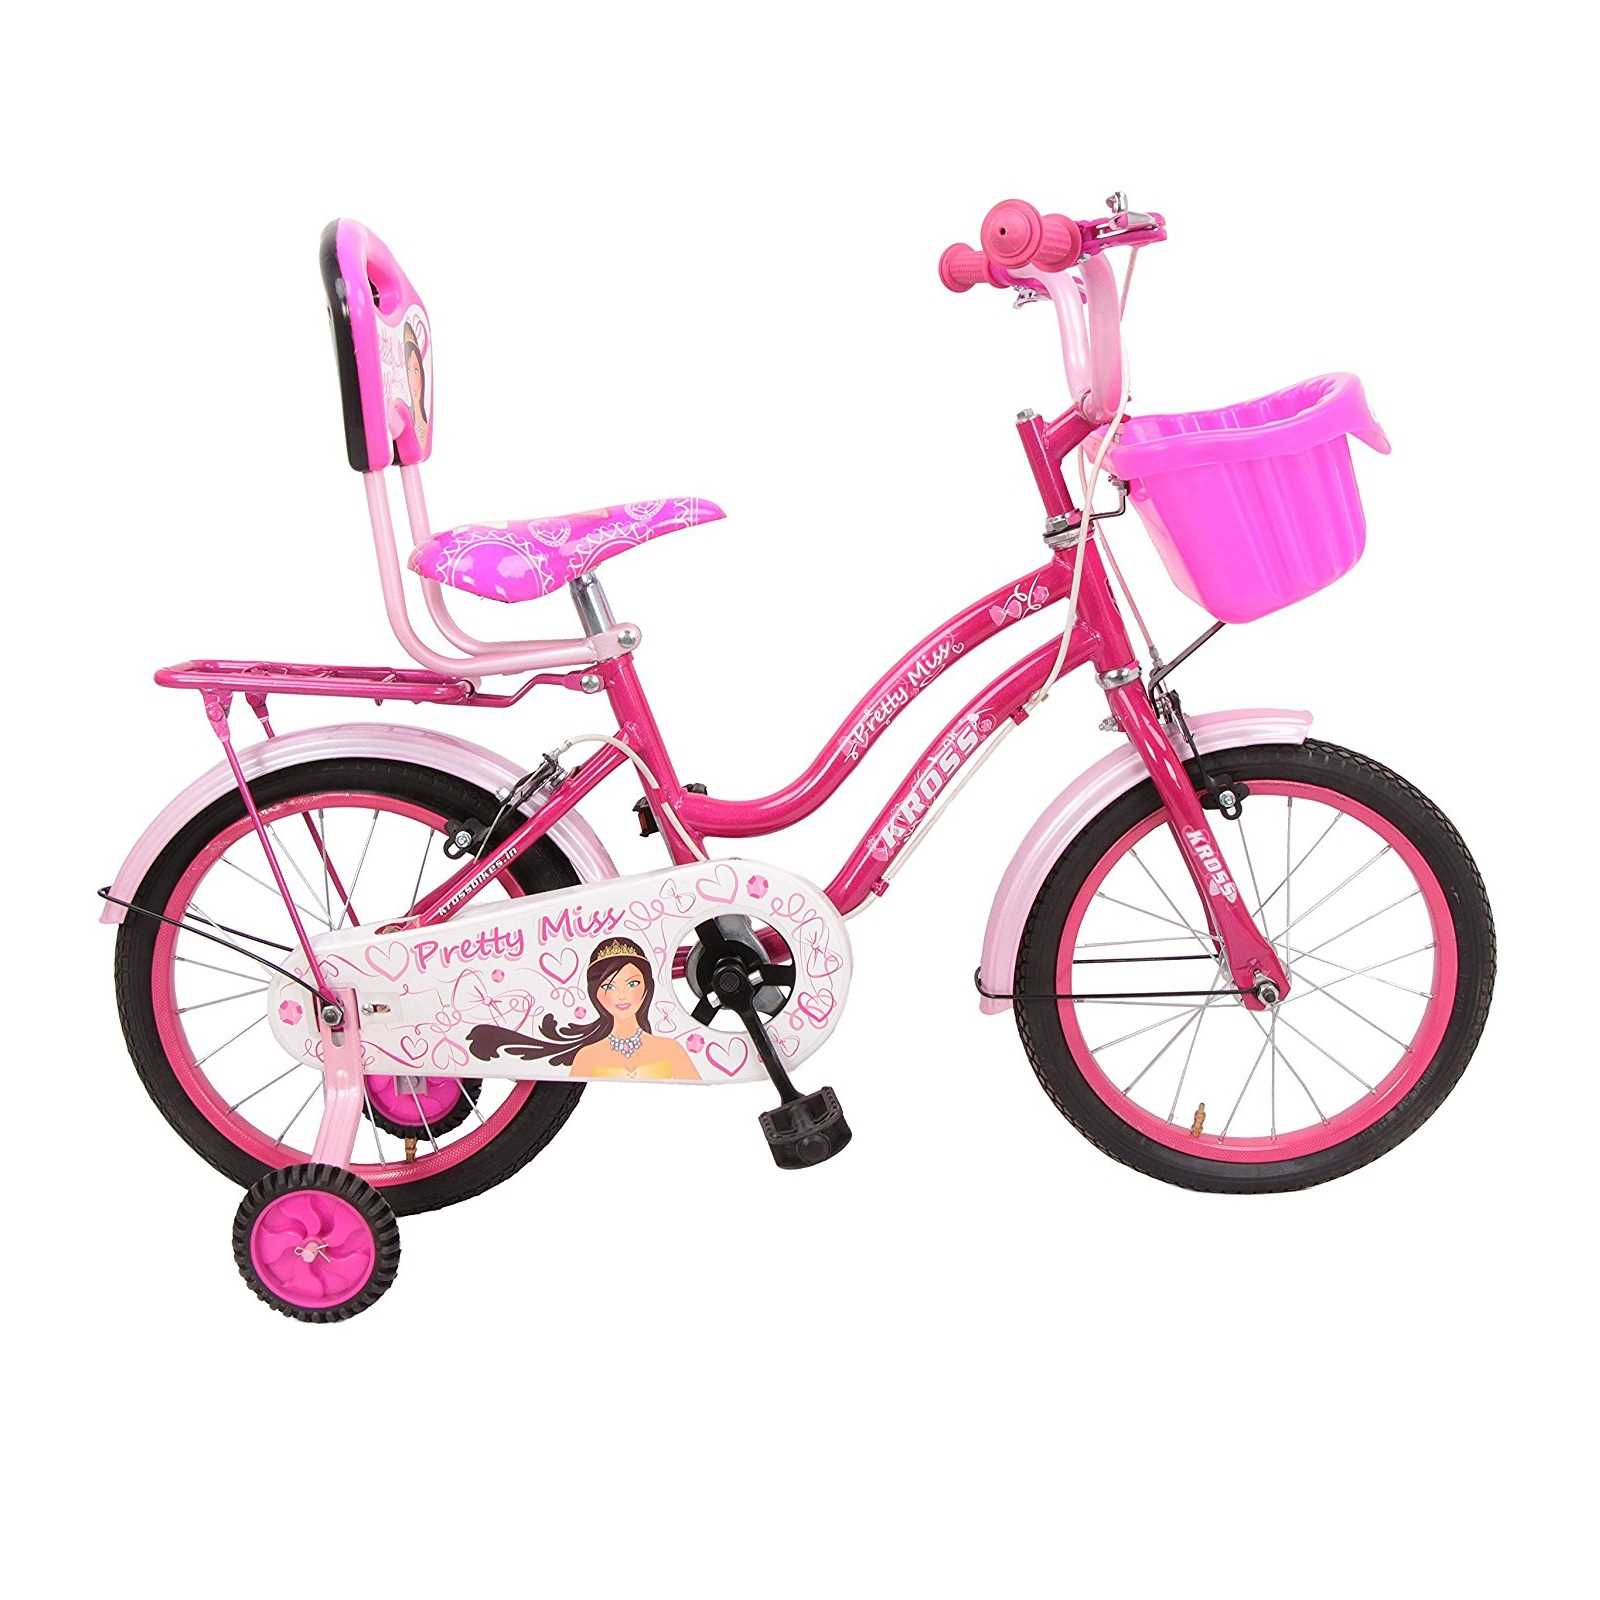 6c6c3135f48 Kross Pretty Miss 16T Single Speed Recreation Cycle Price  19 Apr 2019